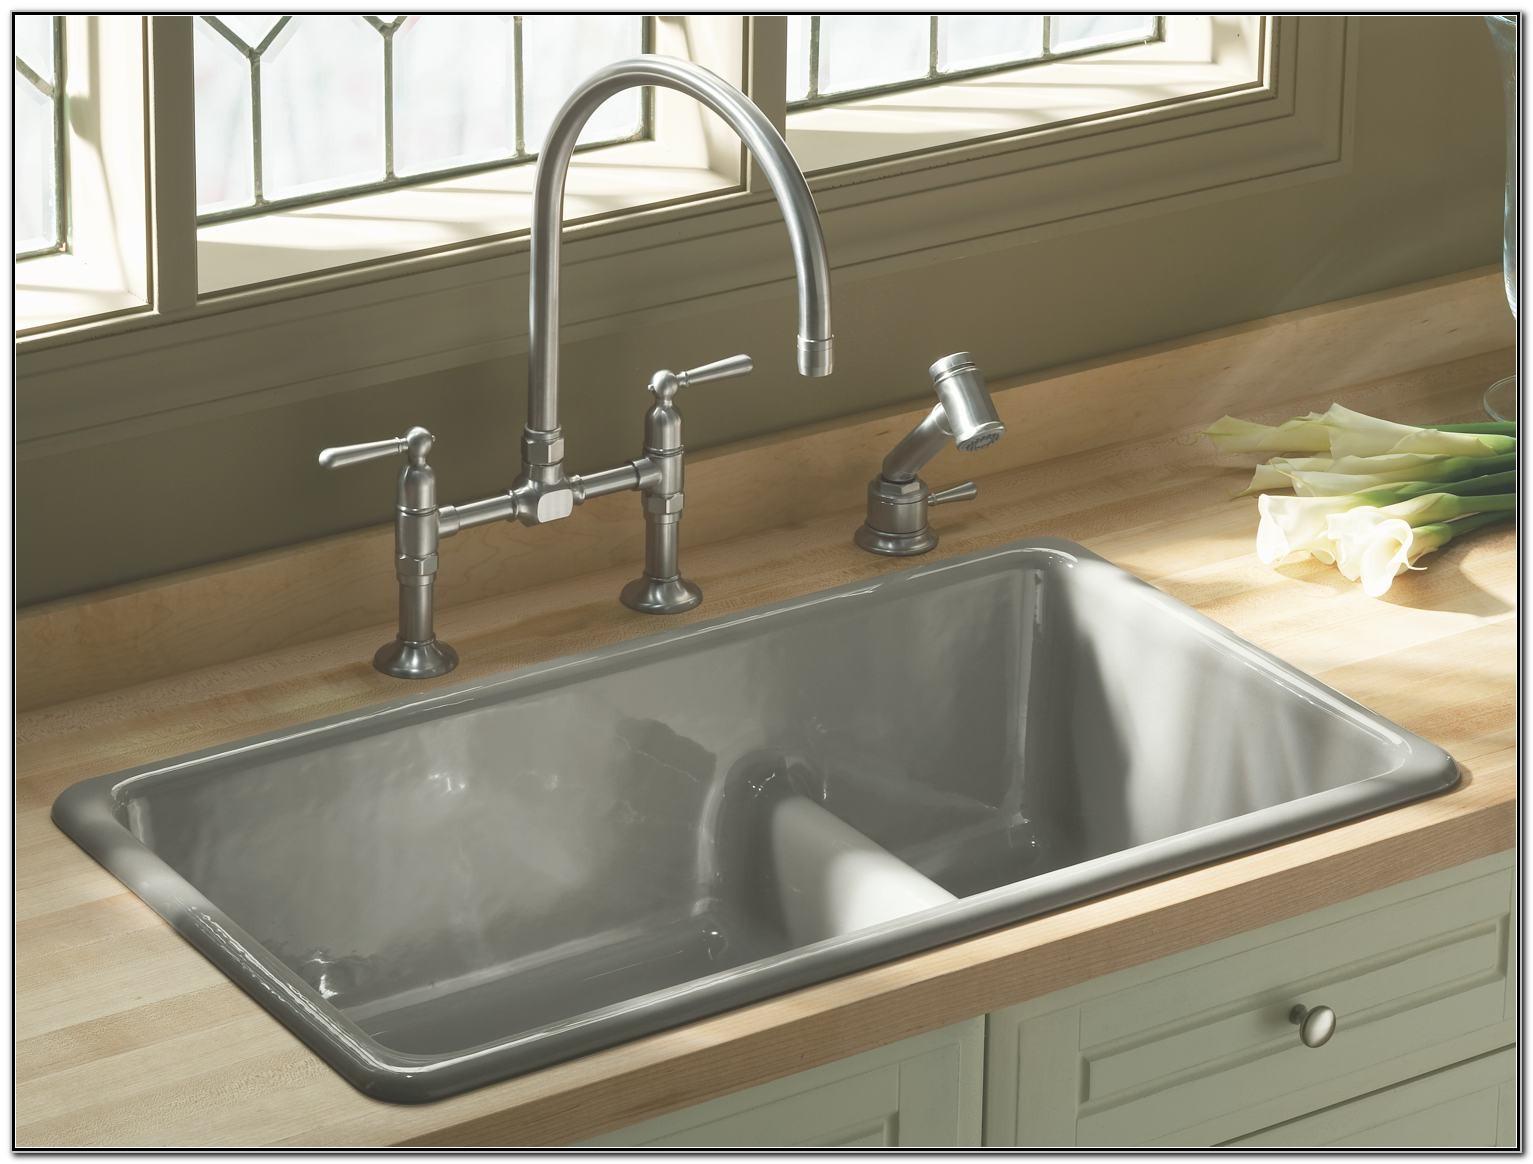 Kohler Porcelain Undermount Kitchen Sinks